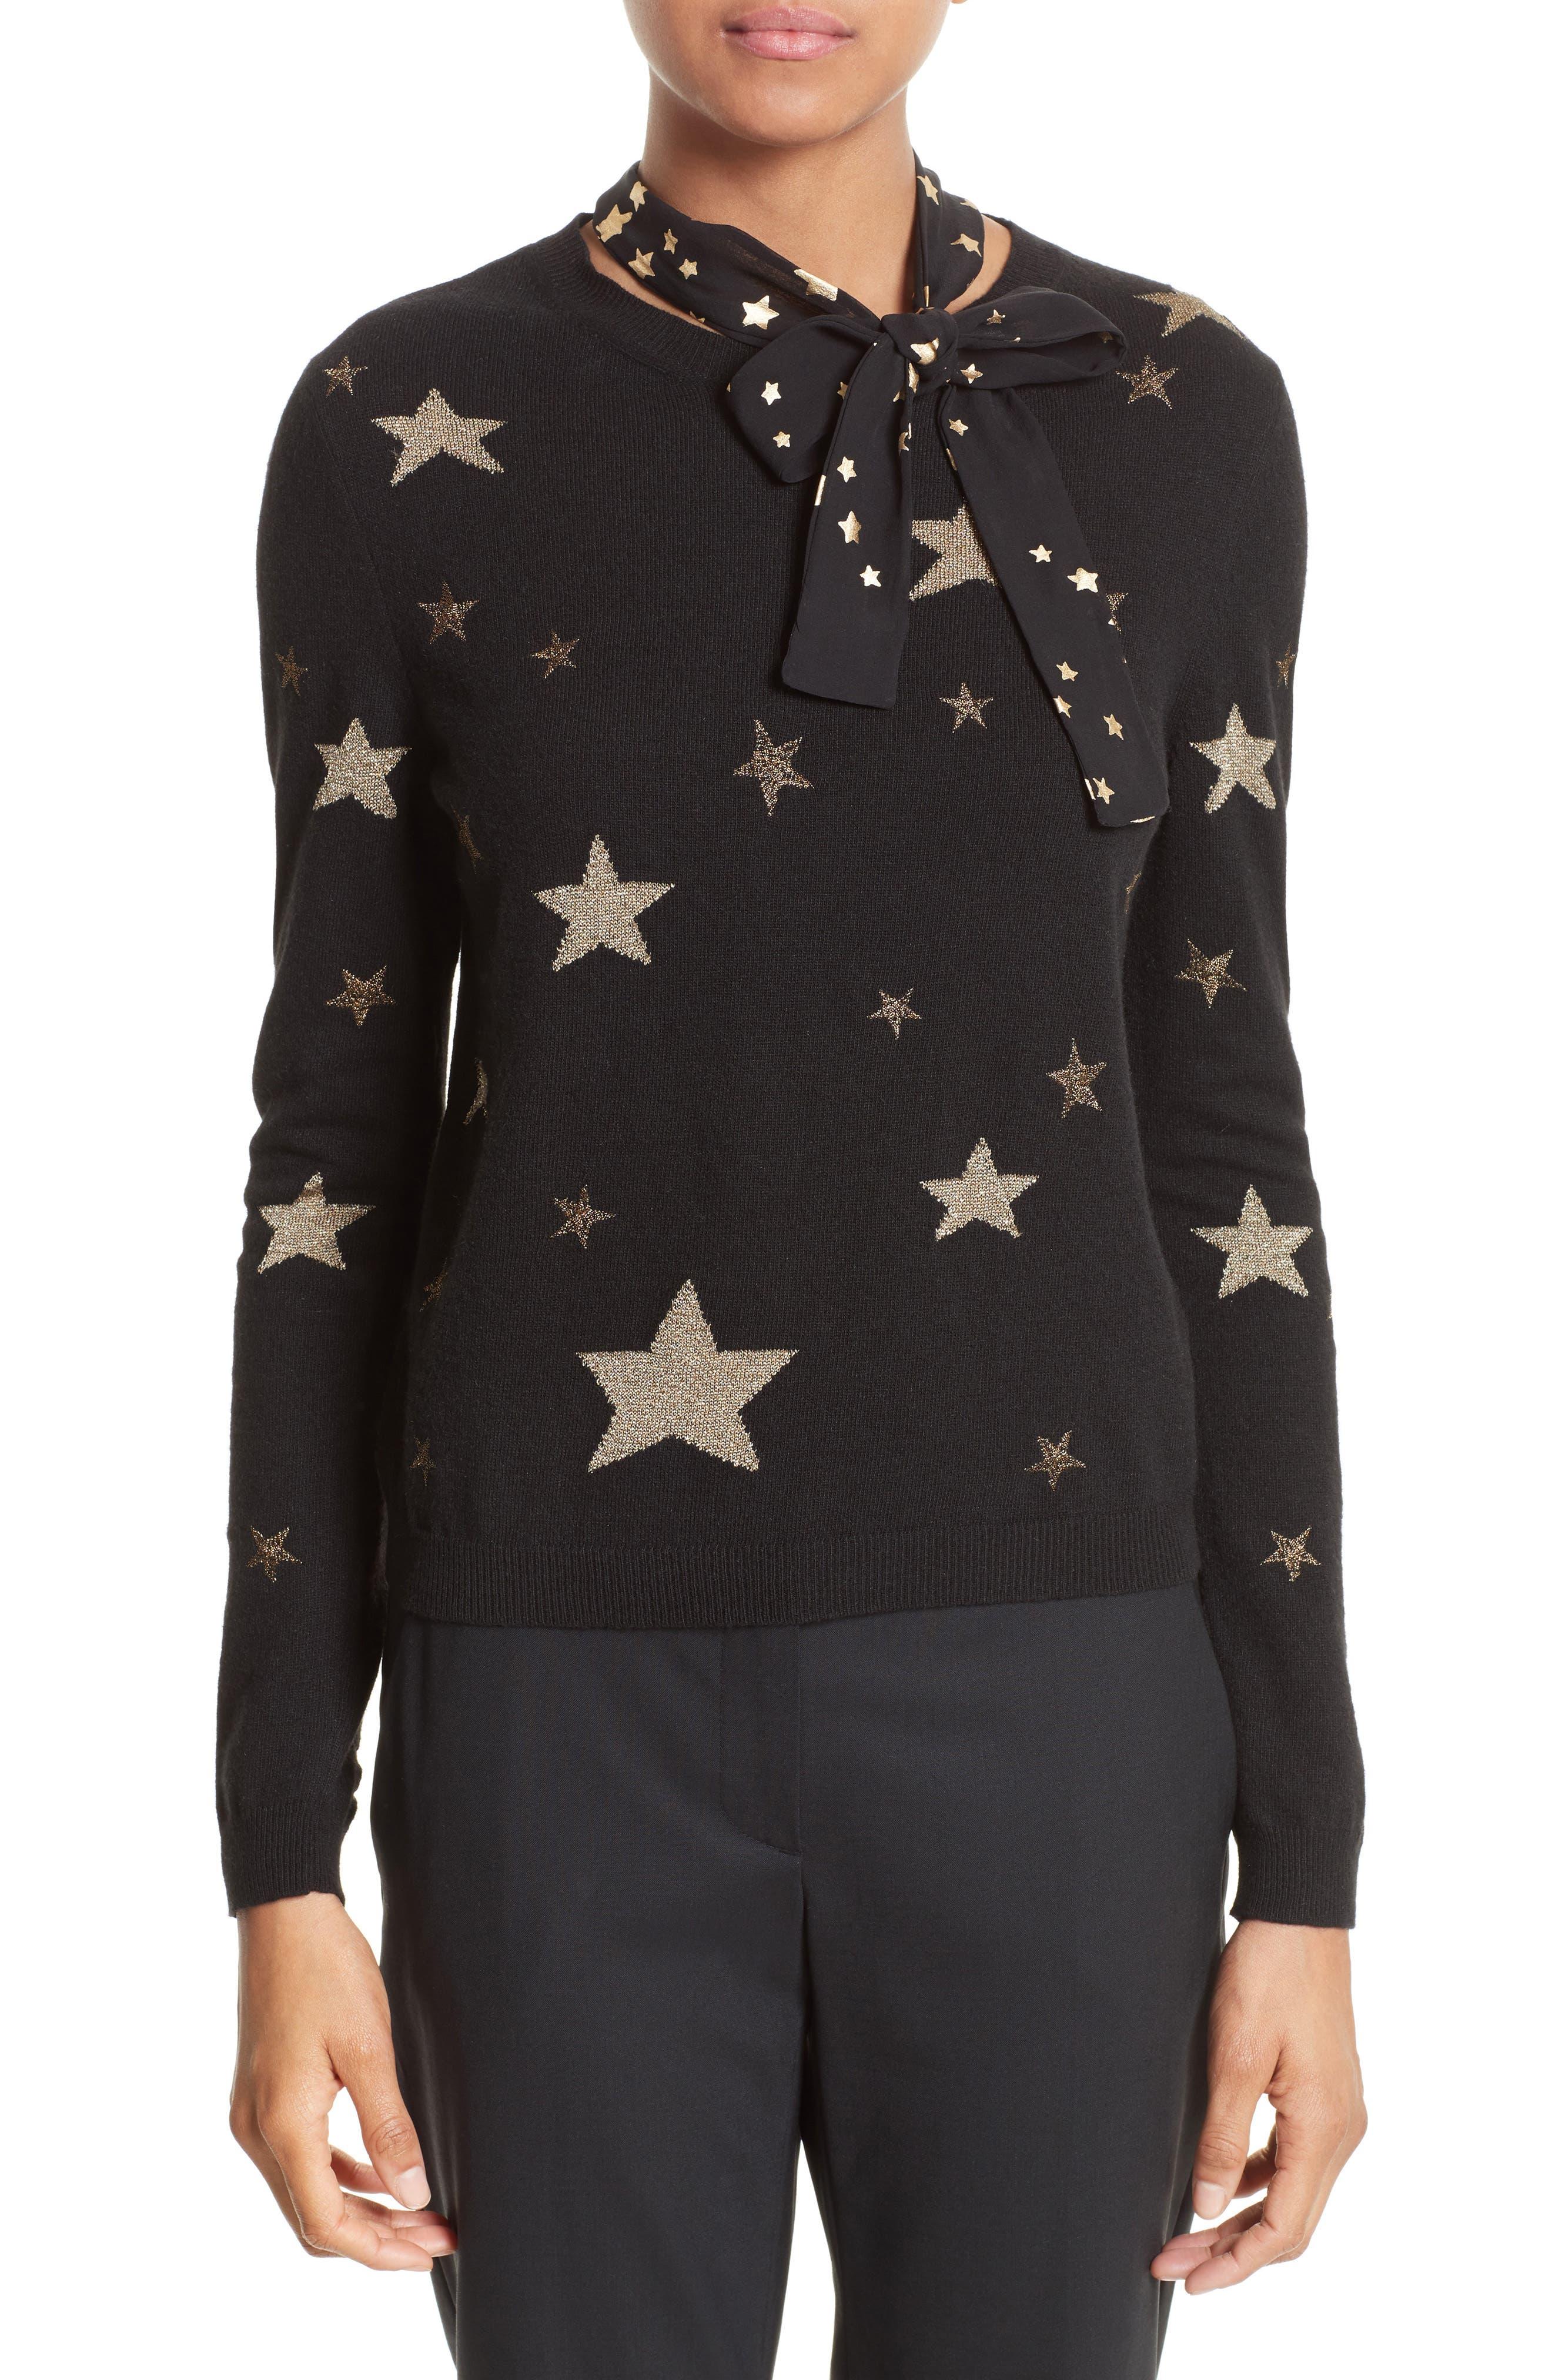 Tie Neck Star Sweater,                             Main thumbnail 1, color,                             Nero